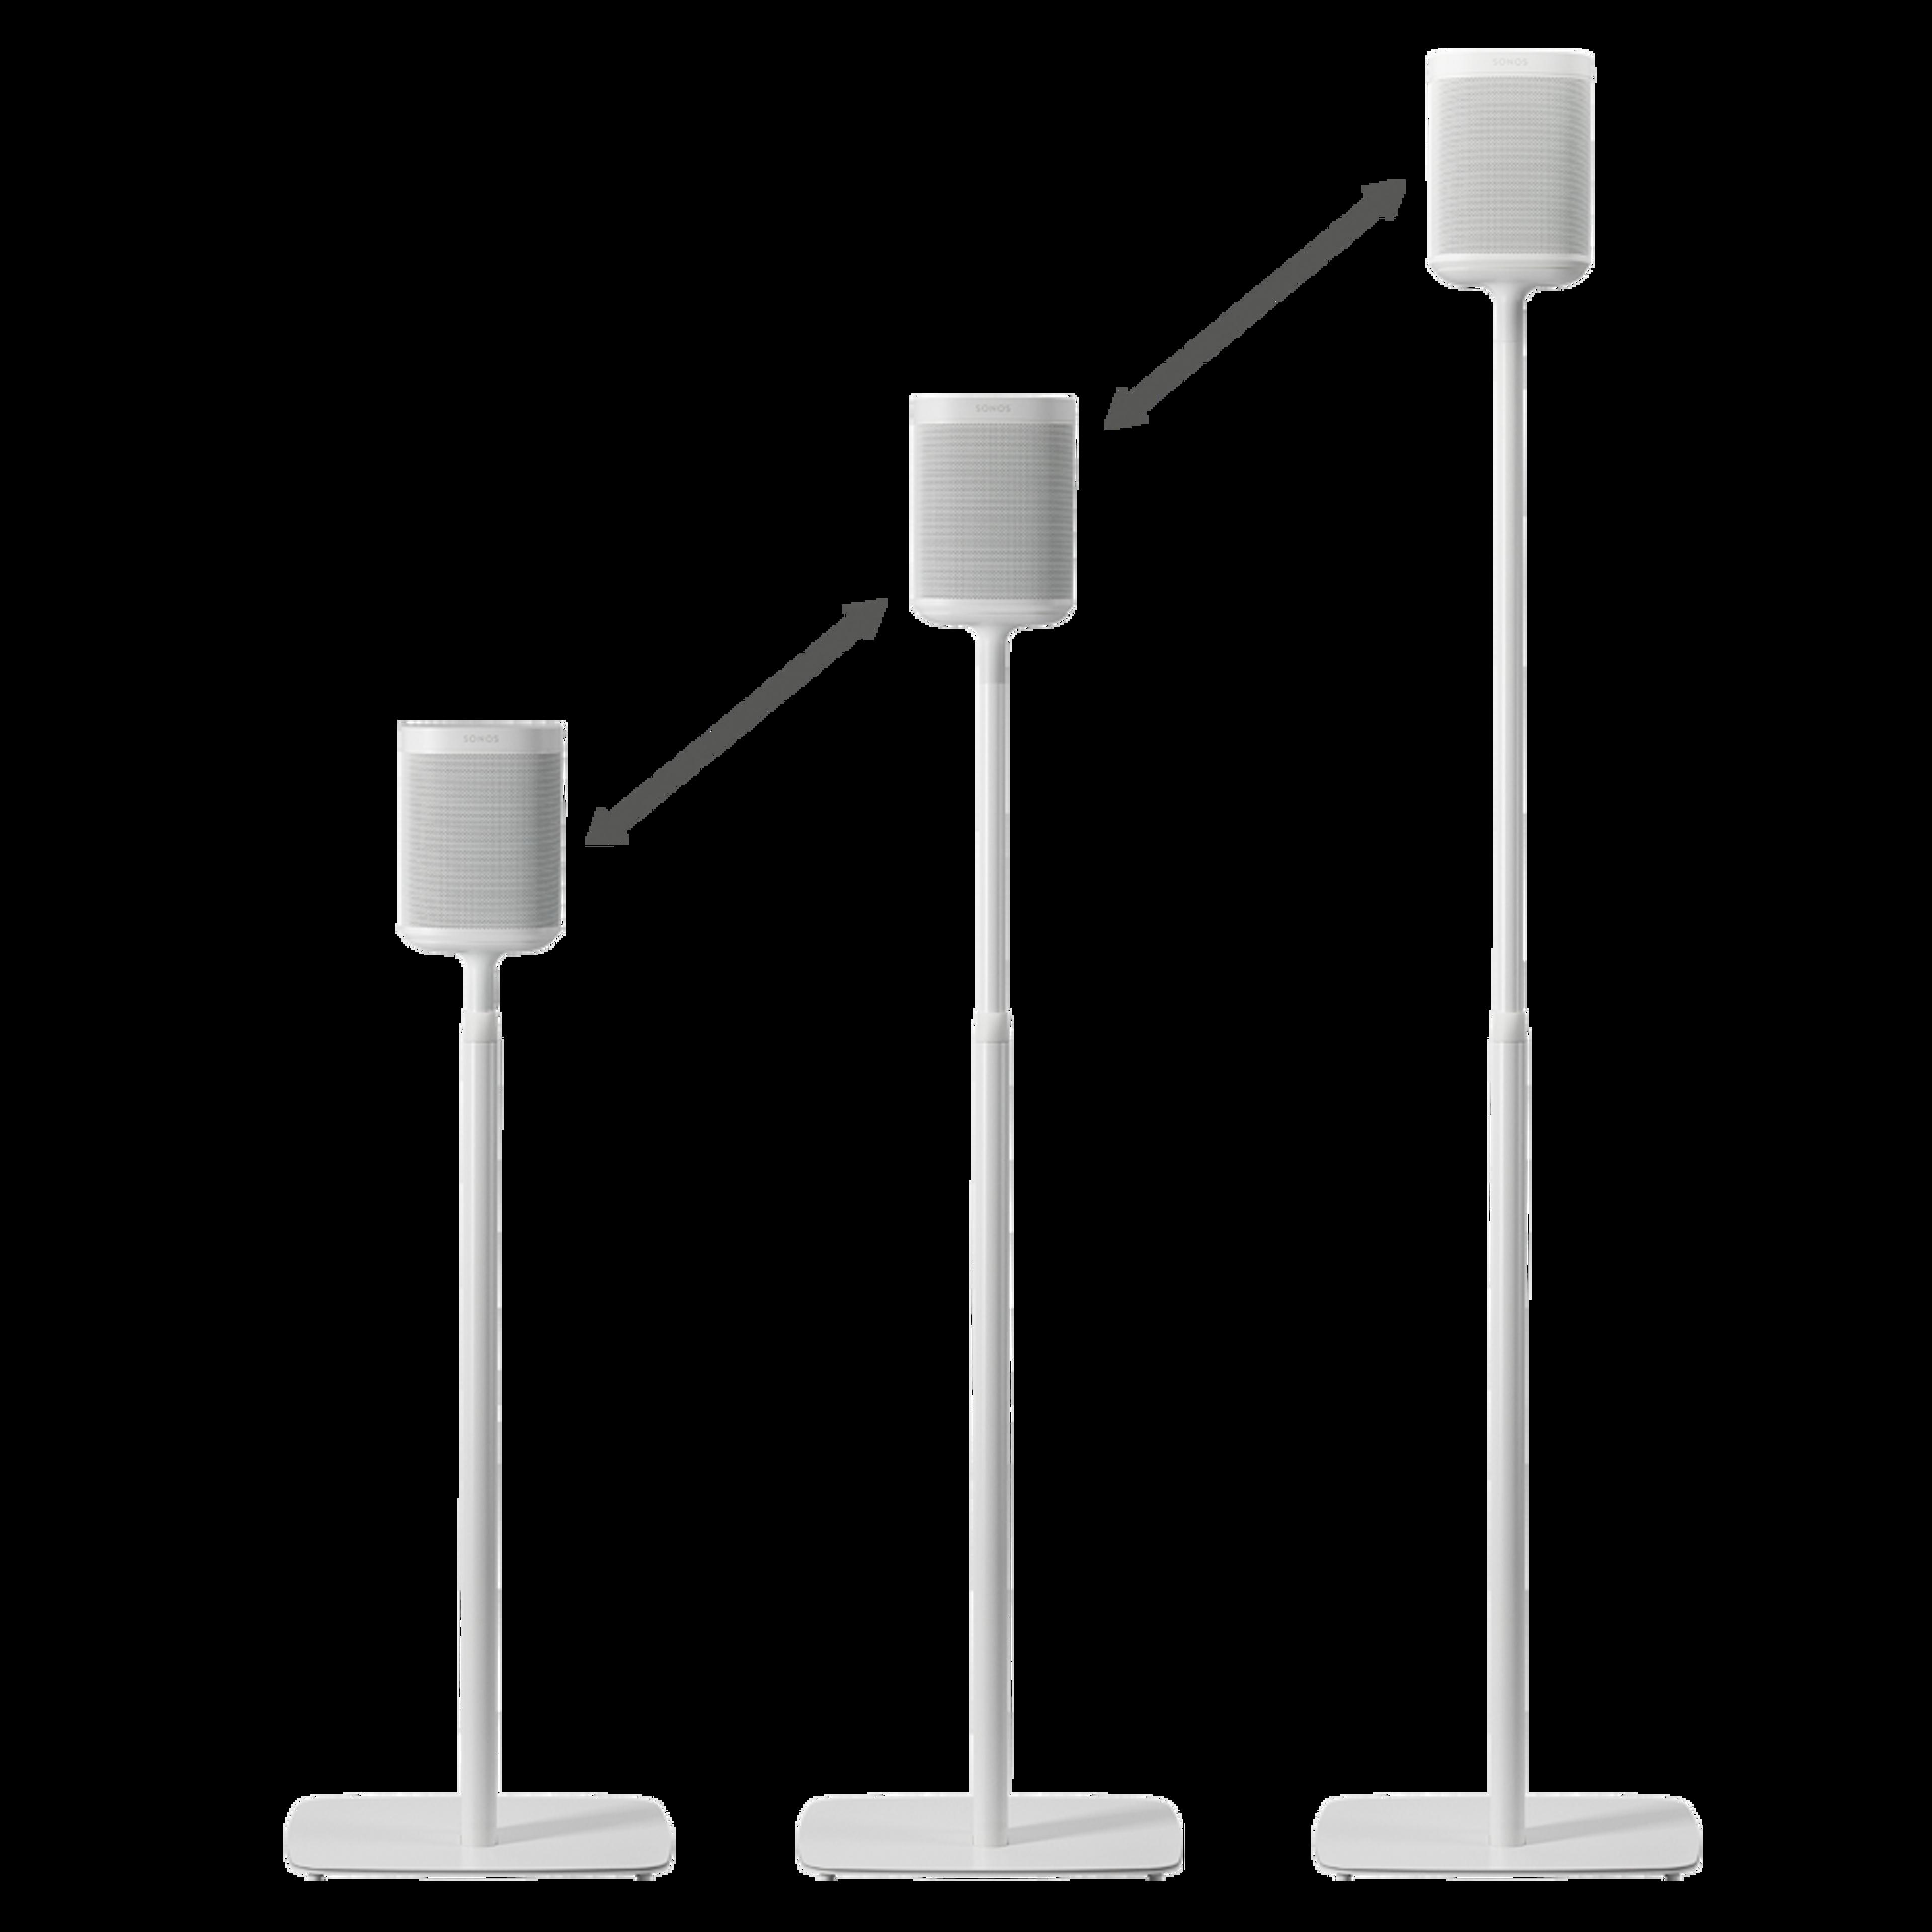 Flexson Adjustable Floor Stand (Pair) sizes white